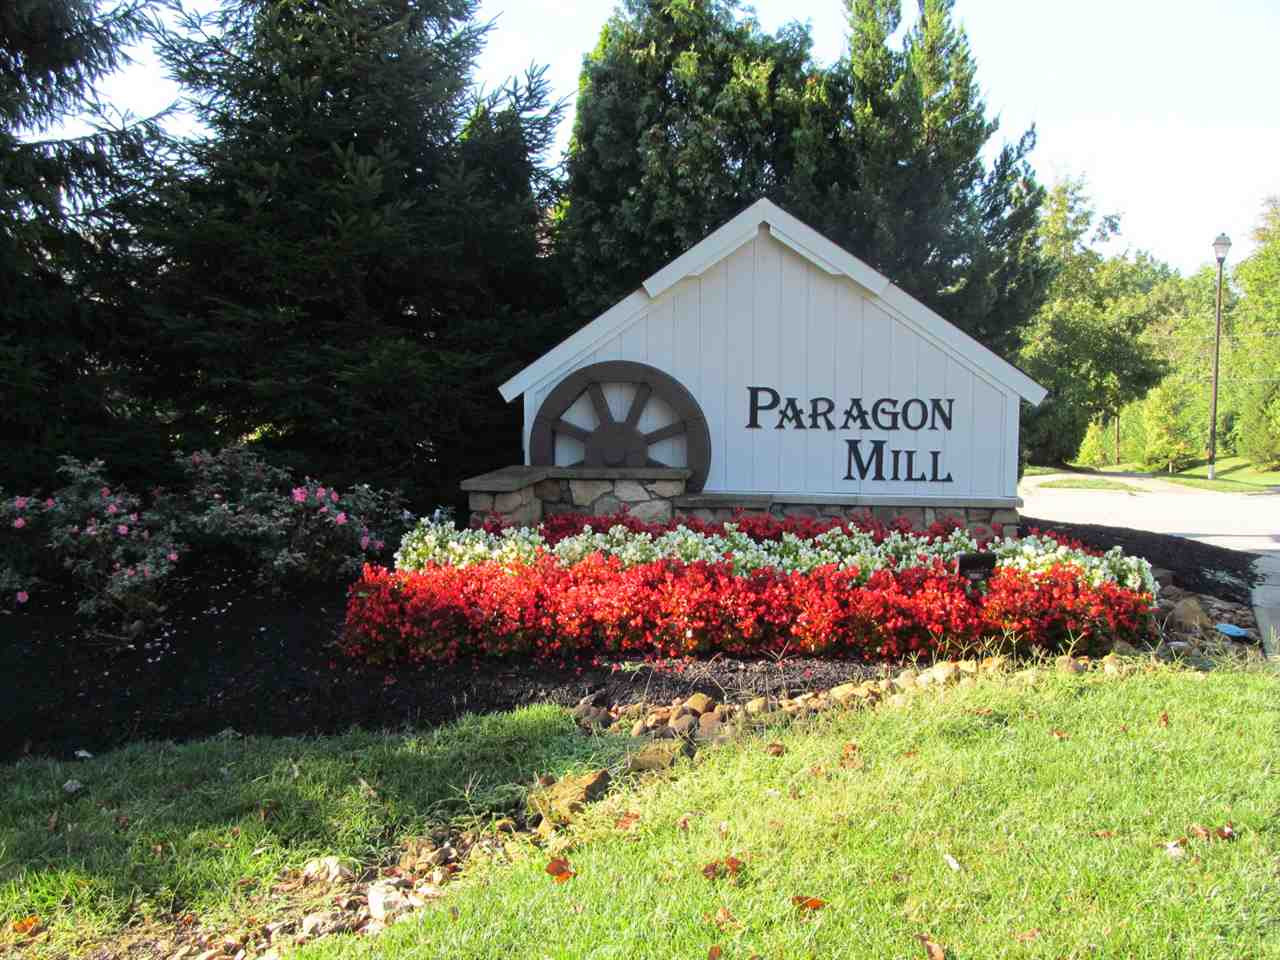 Photo 2 for 2647 Paragon Mill Burlington, KY 41005